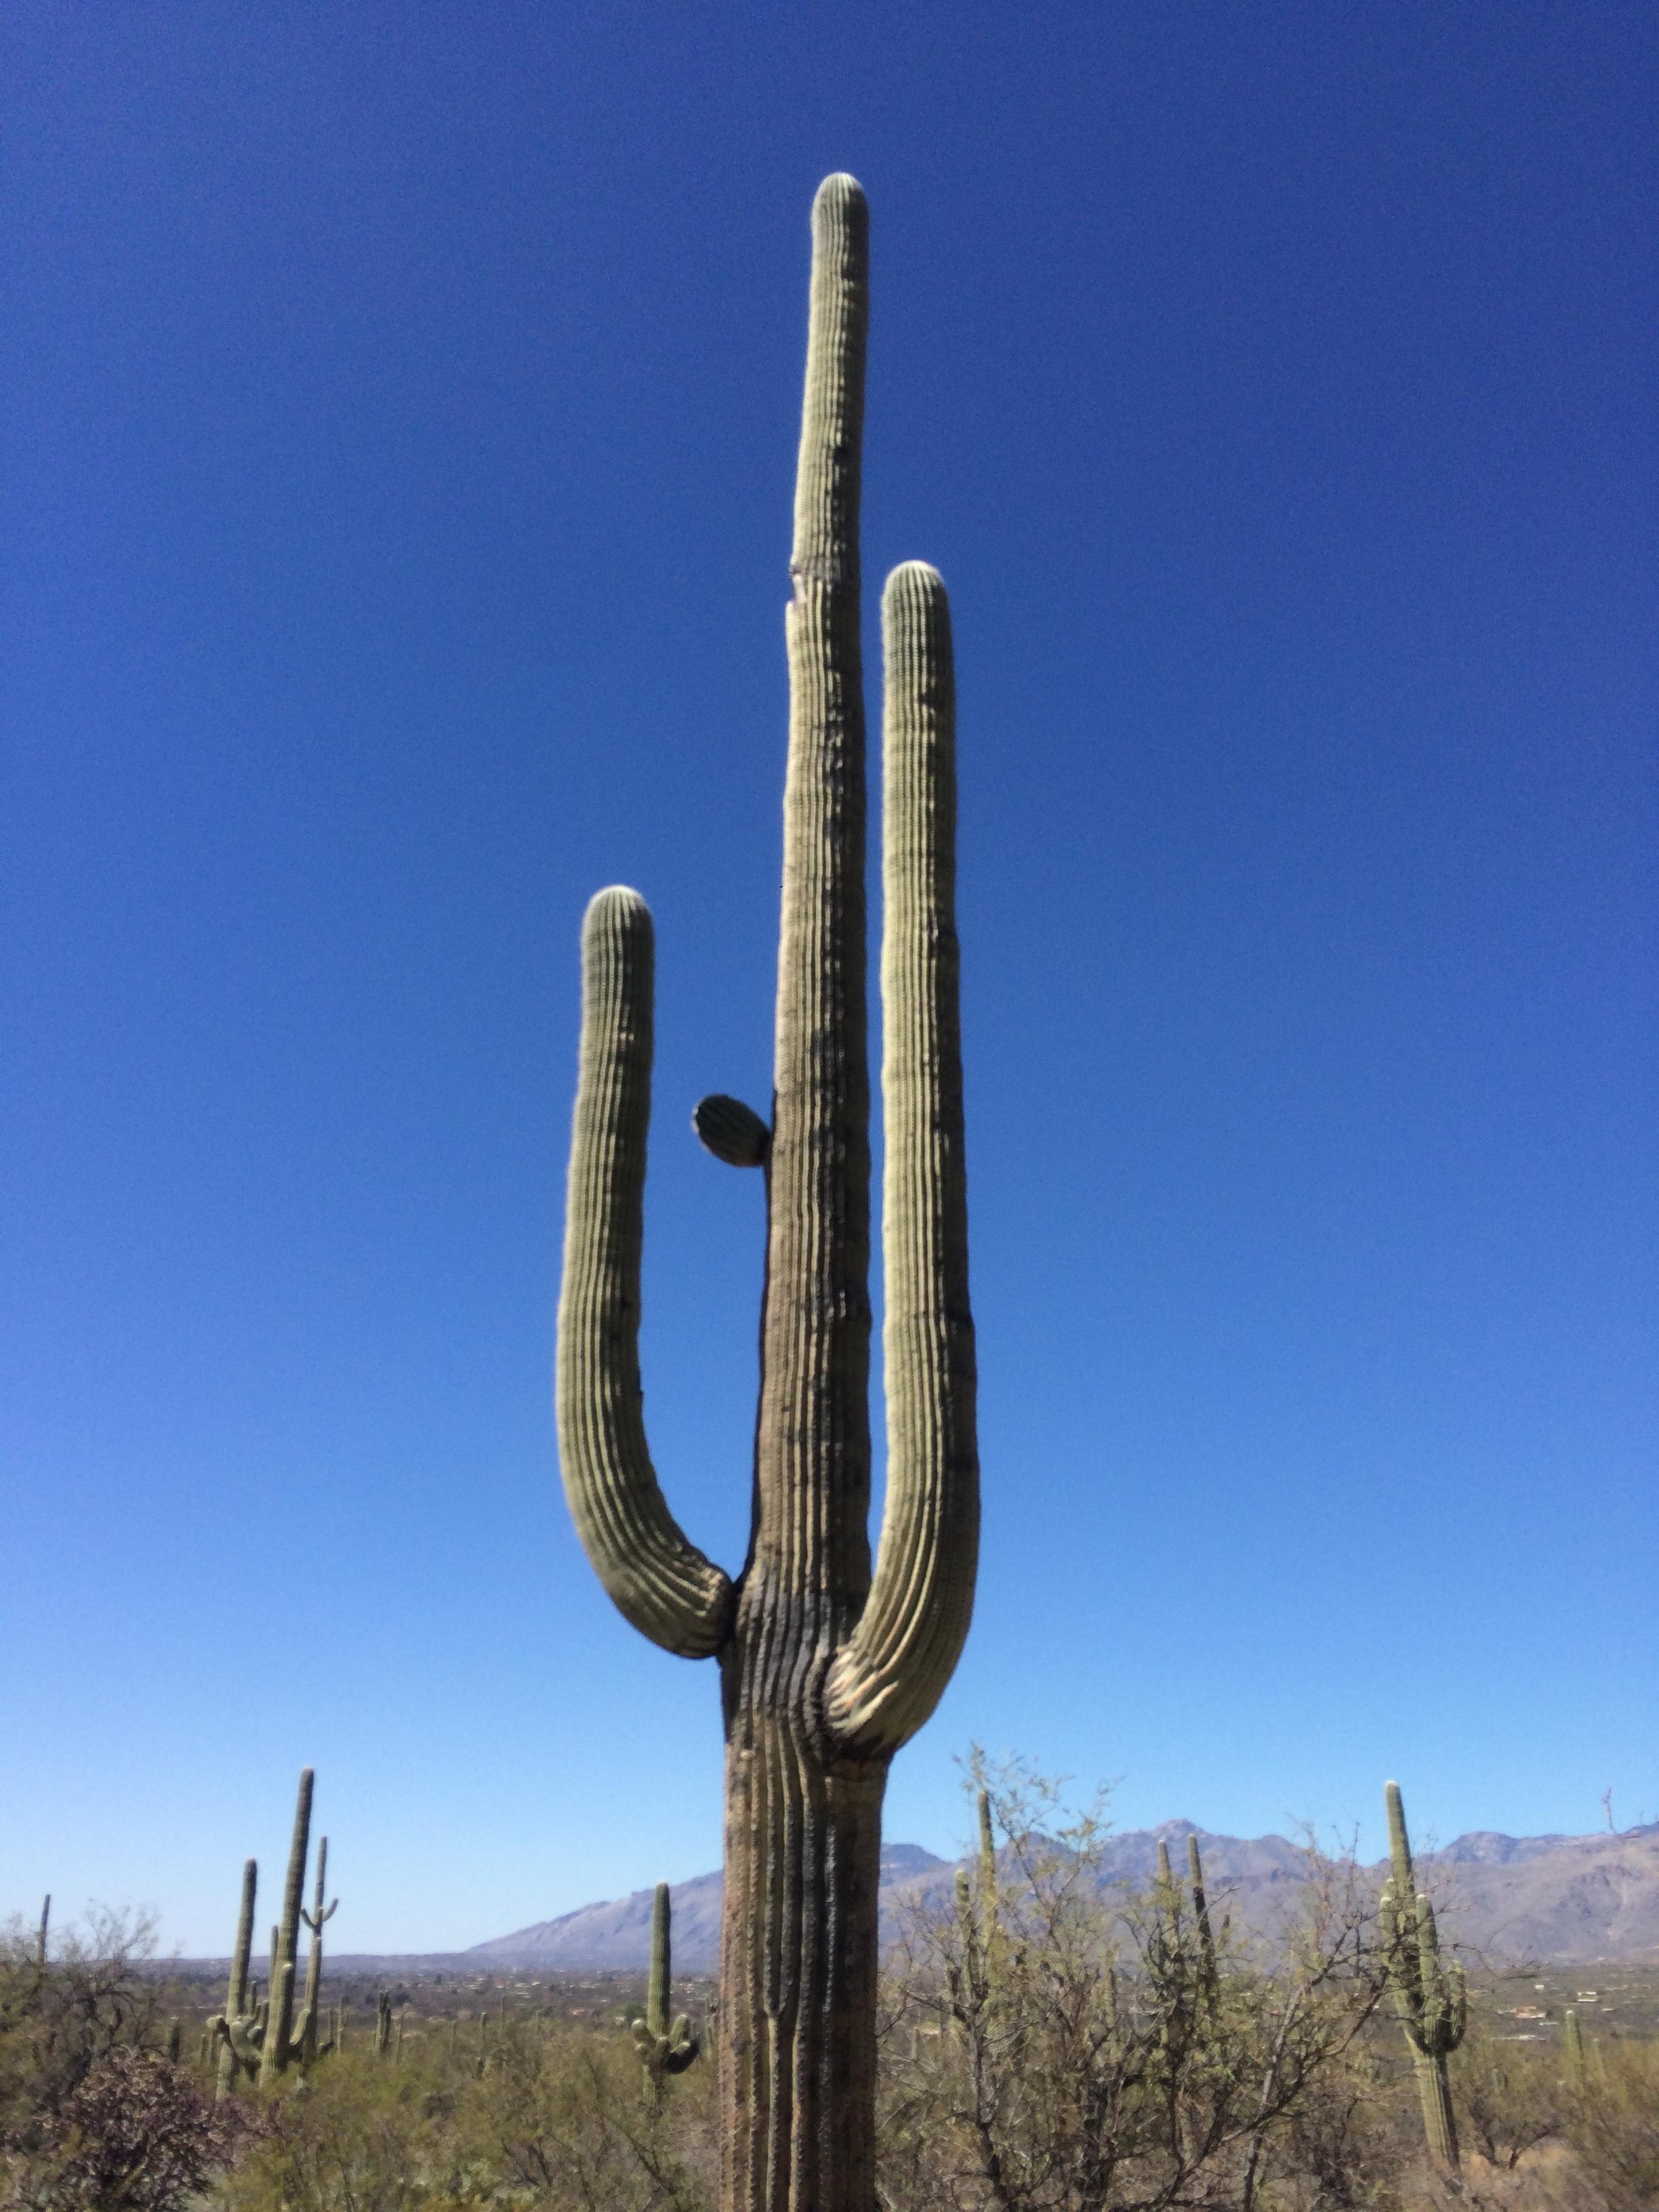 Saguaros dwarf mere humans.